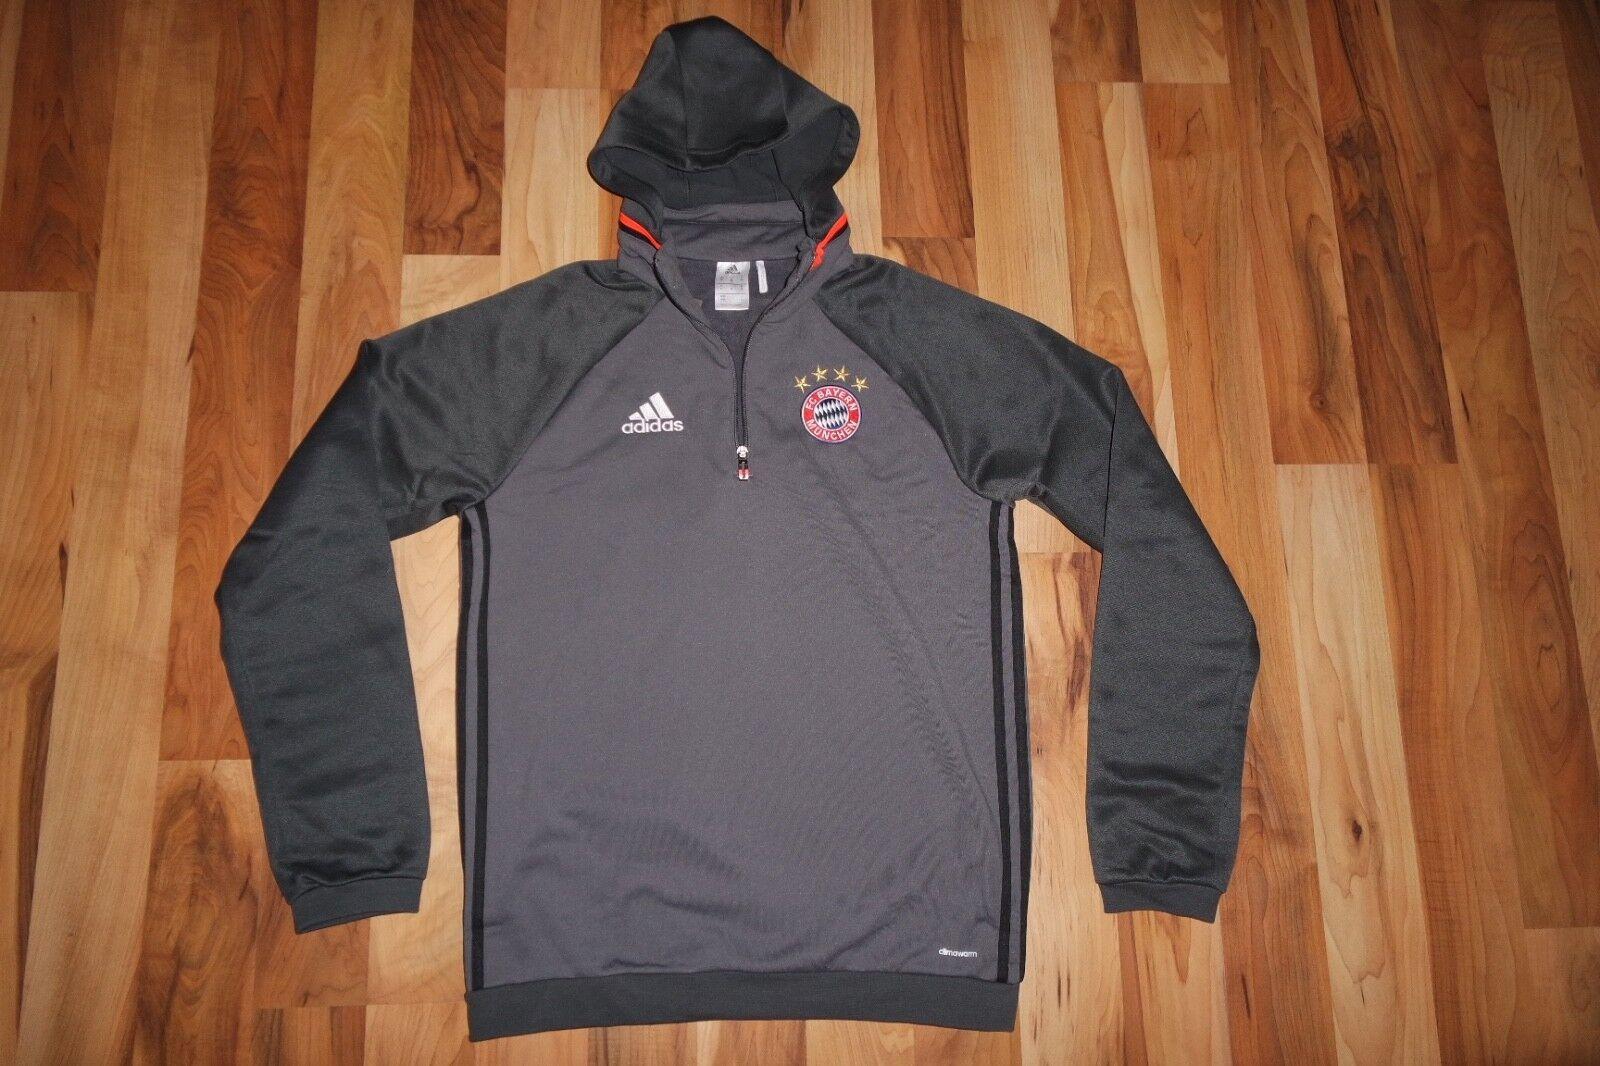 NWT Adidas Bayern München Munich Fleece Top Full Zip Hoodie GRANITE AO0334 M